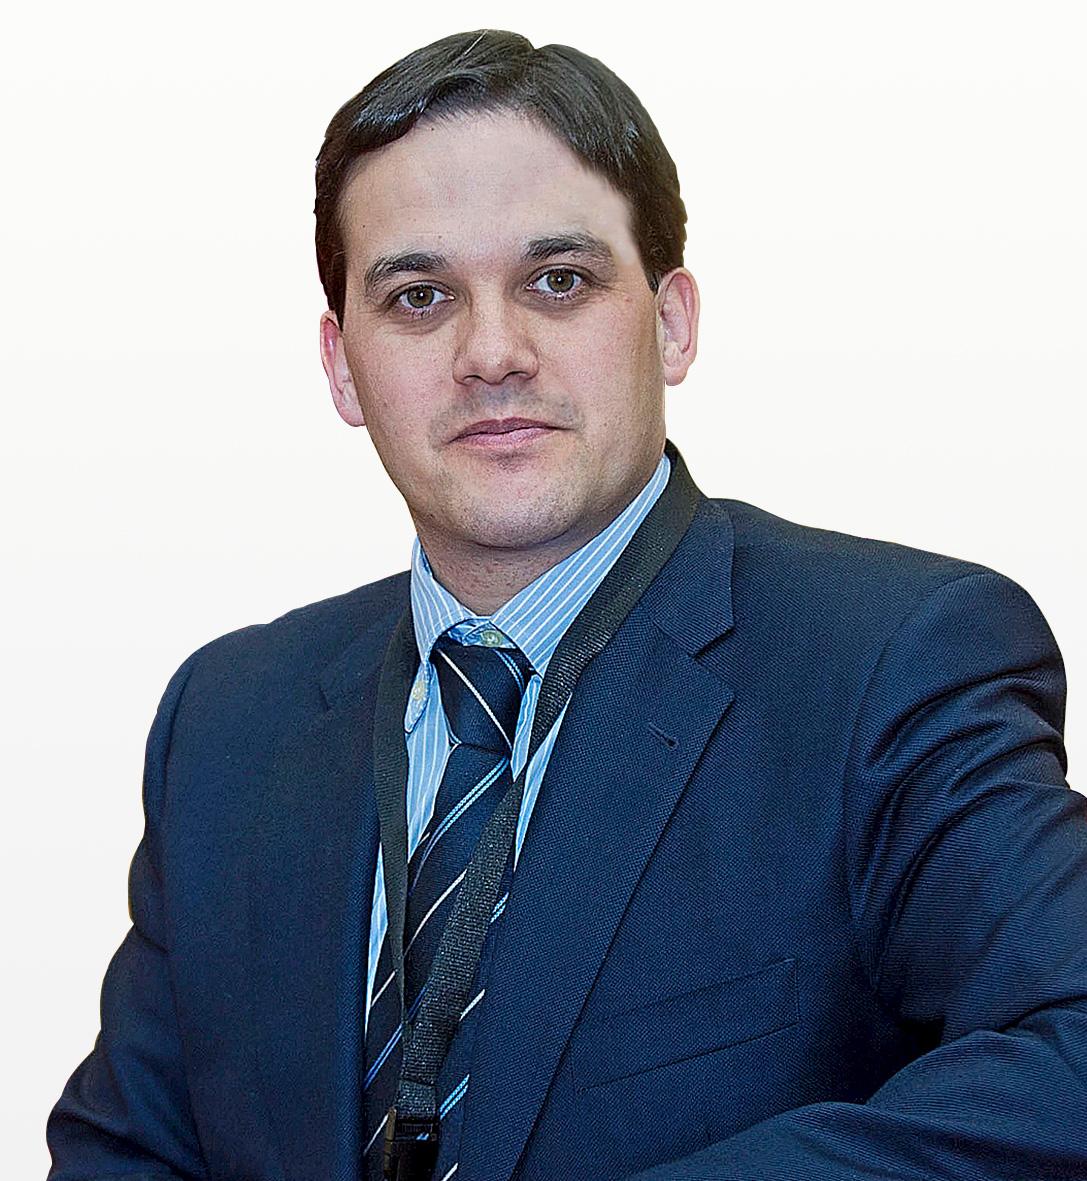 Dr. Oliver Marín Peña